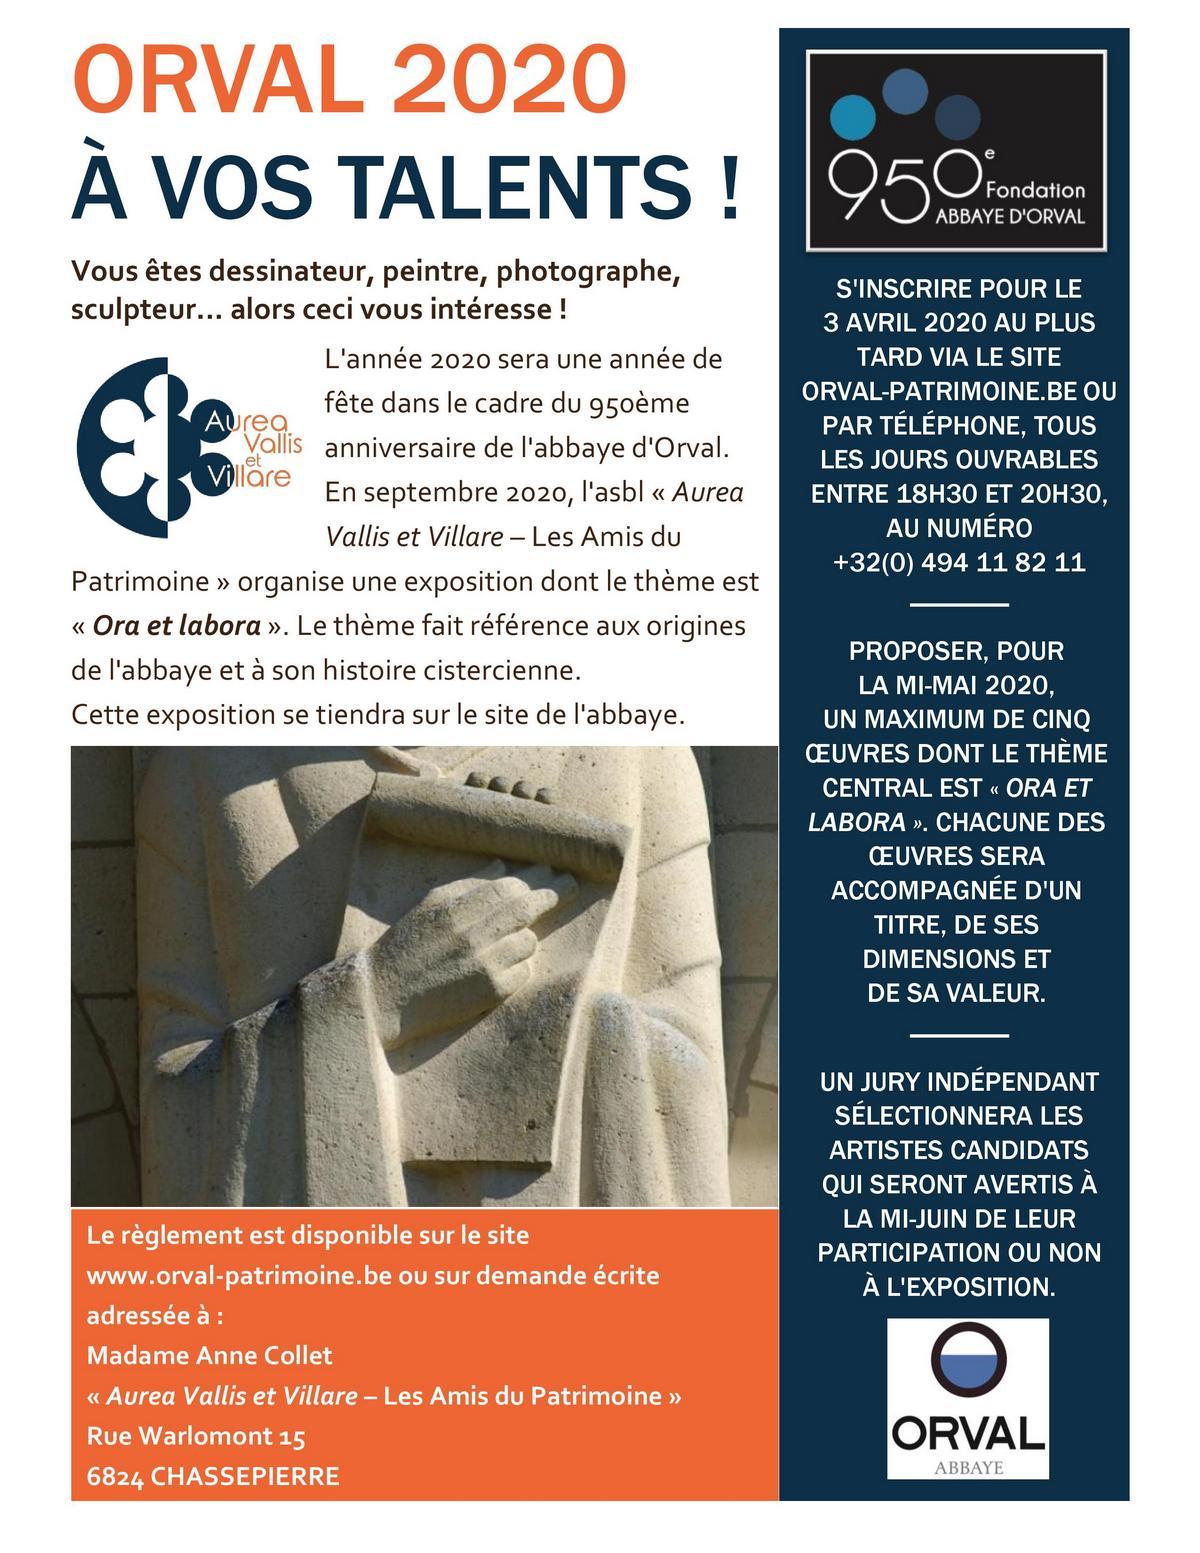 Orval 2020 - Exposition - Appel aux artistes